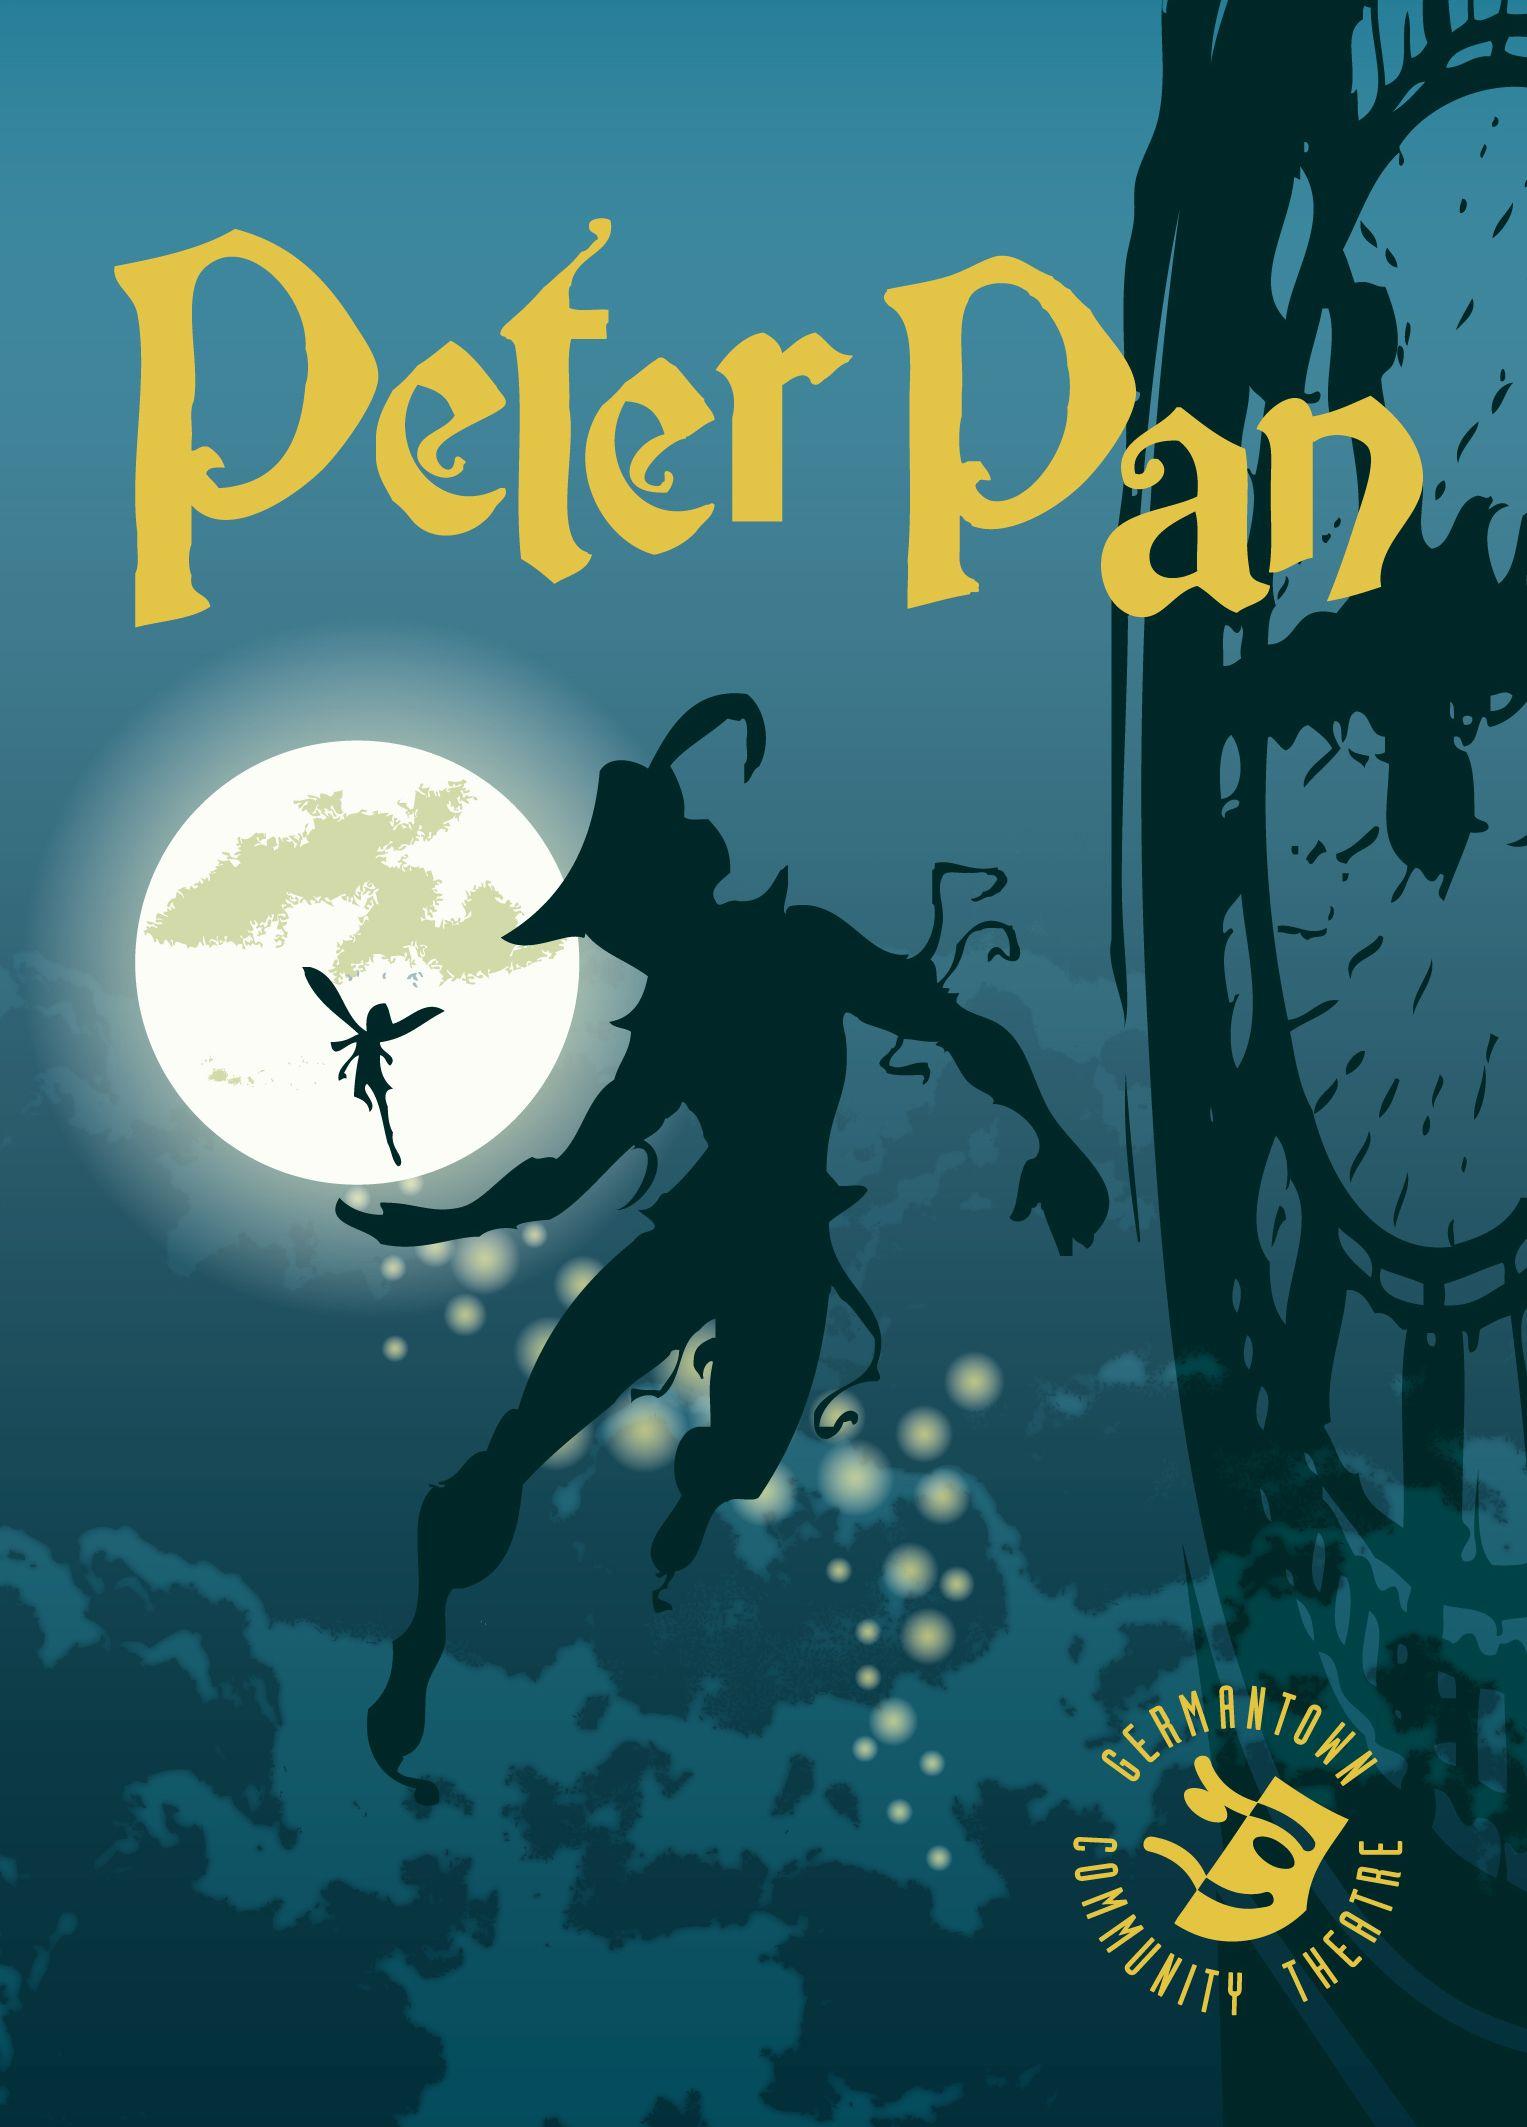 peter Pan graphic design - Google Search